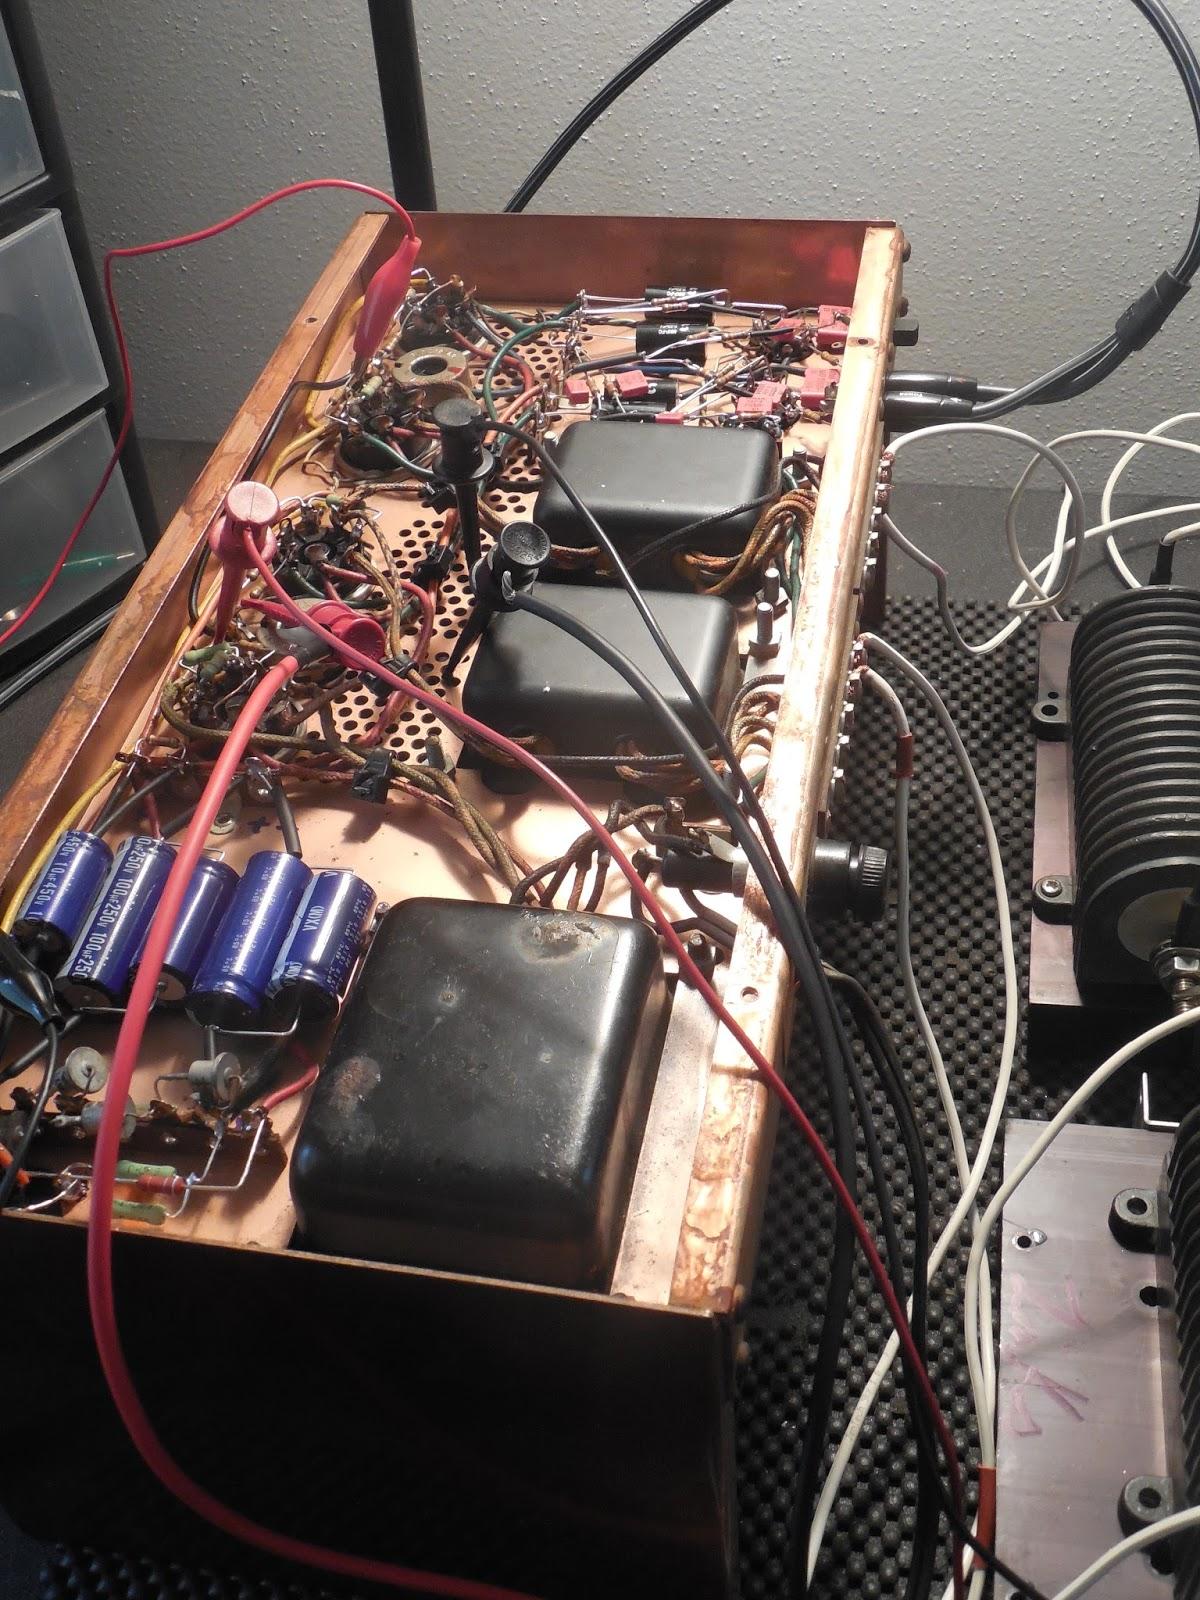 Harman Luxury Audio News: Vintage Hi-Fi Audio Restorations: Harman Kardon 250 Stereo Tube Power Amplifier